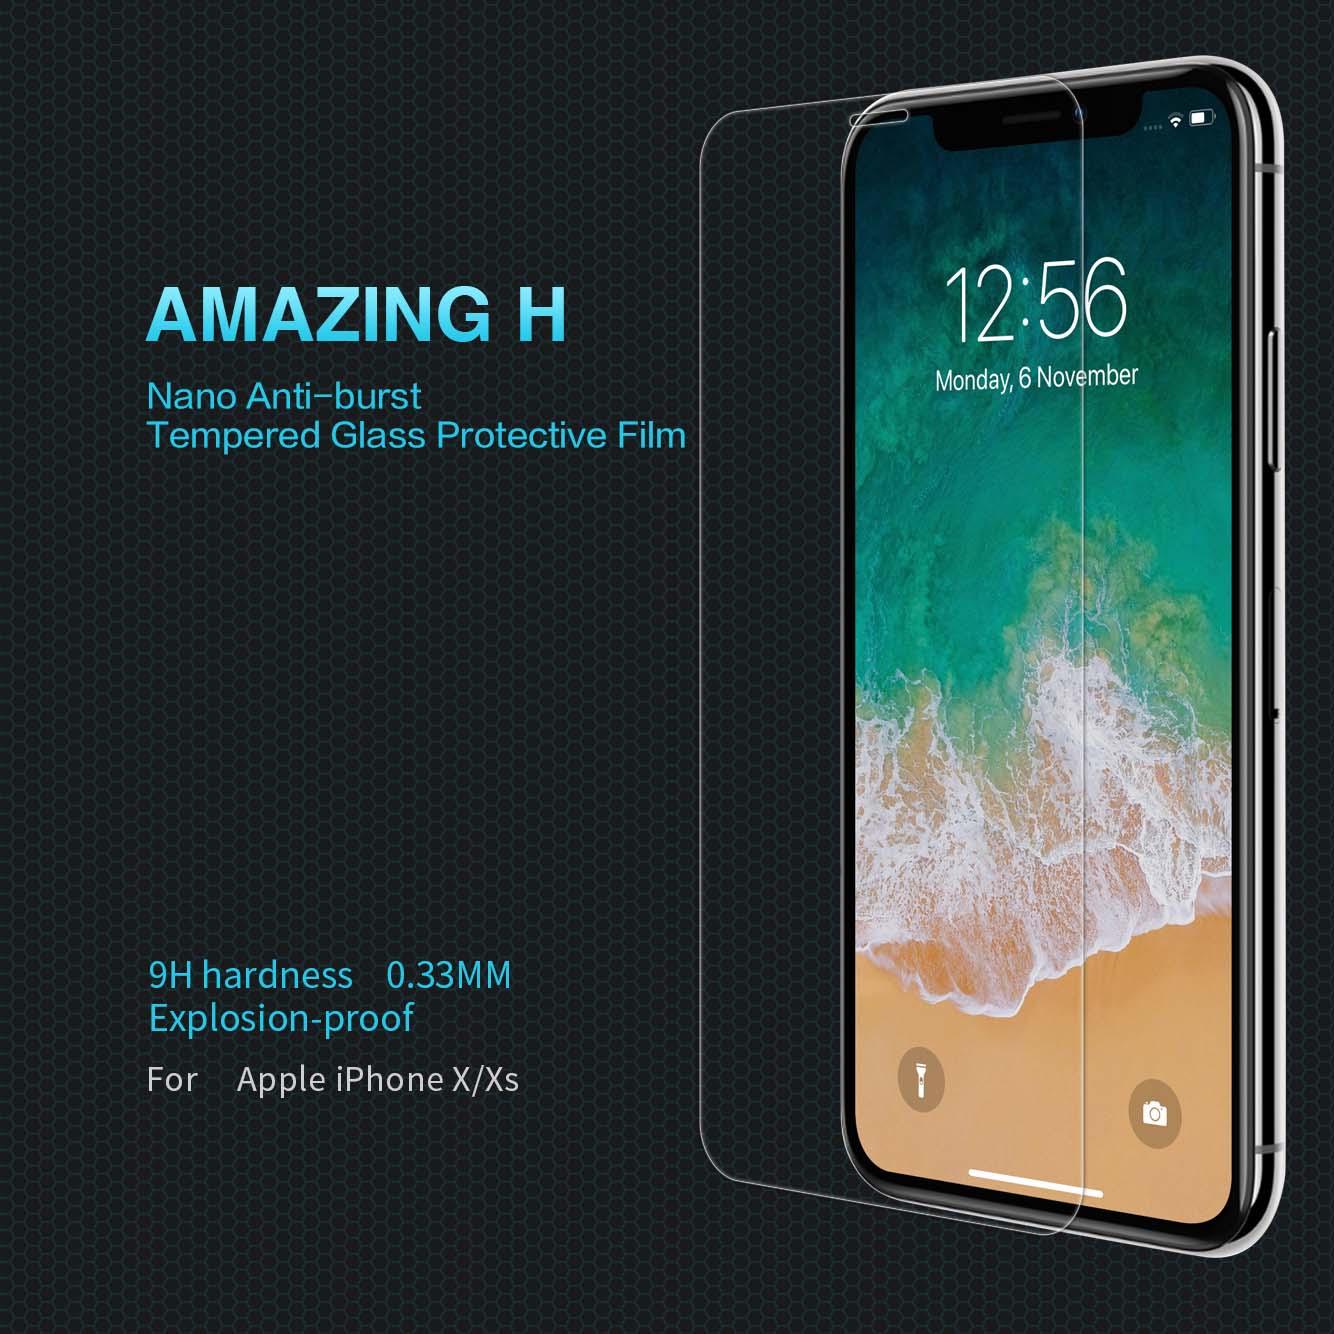 iPhone X/XS screen protector